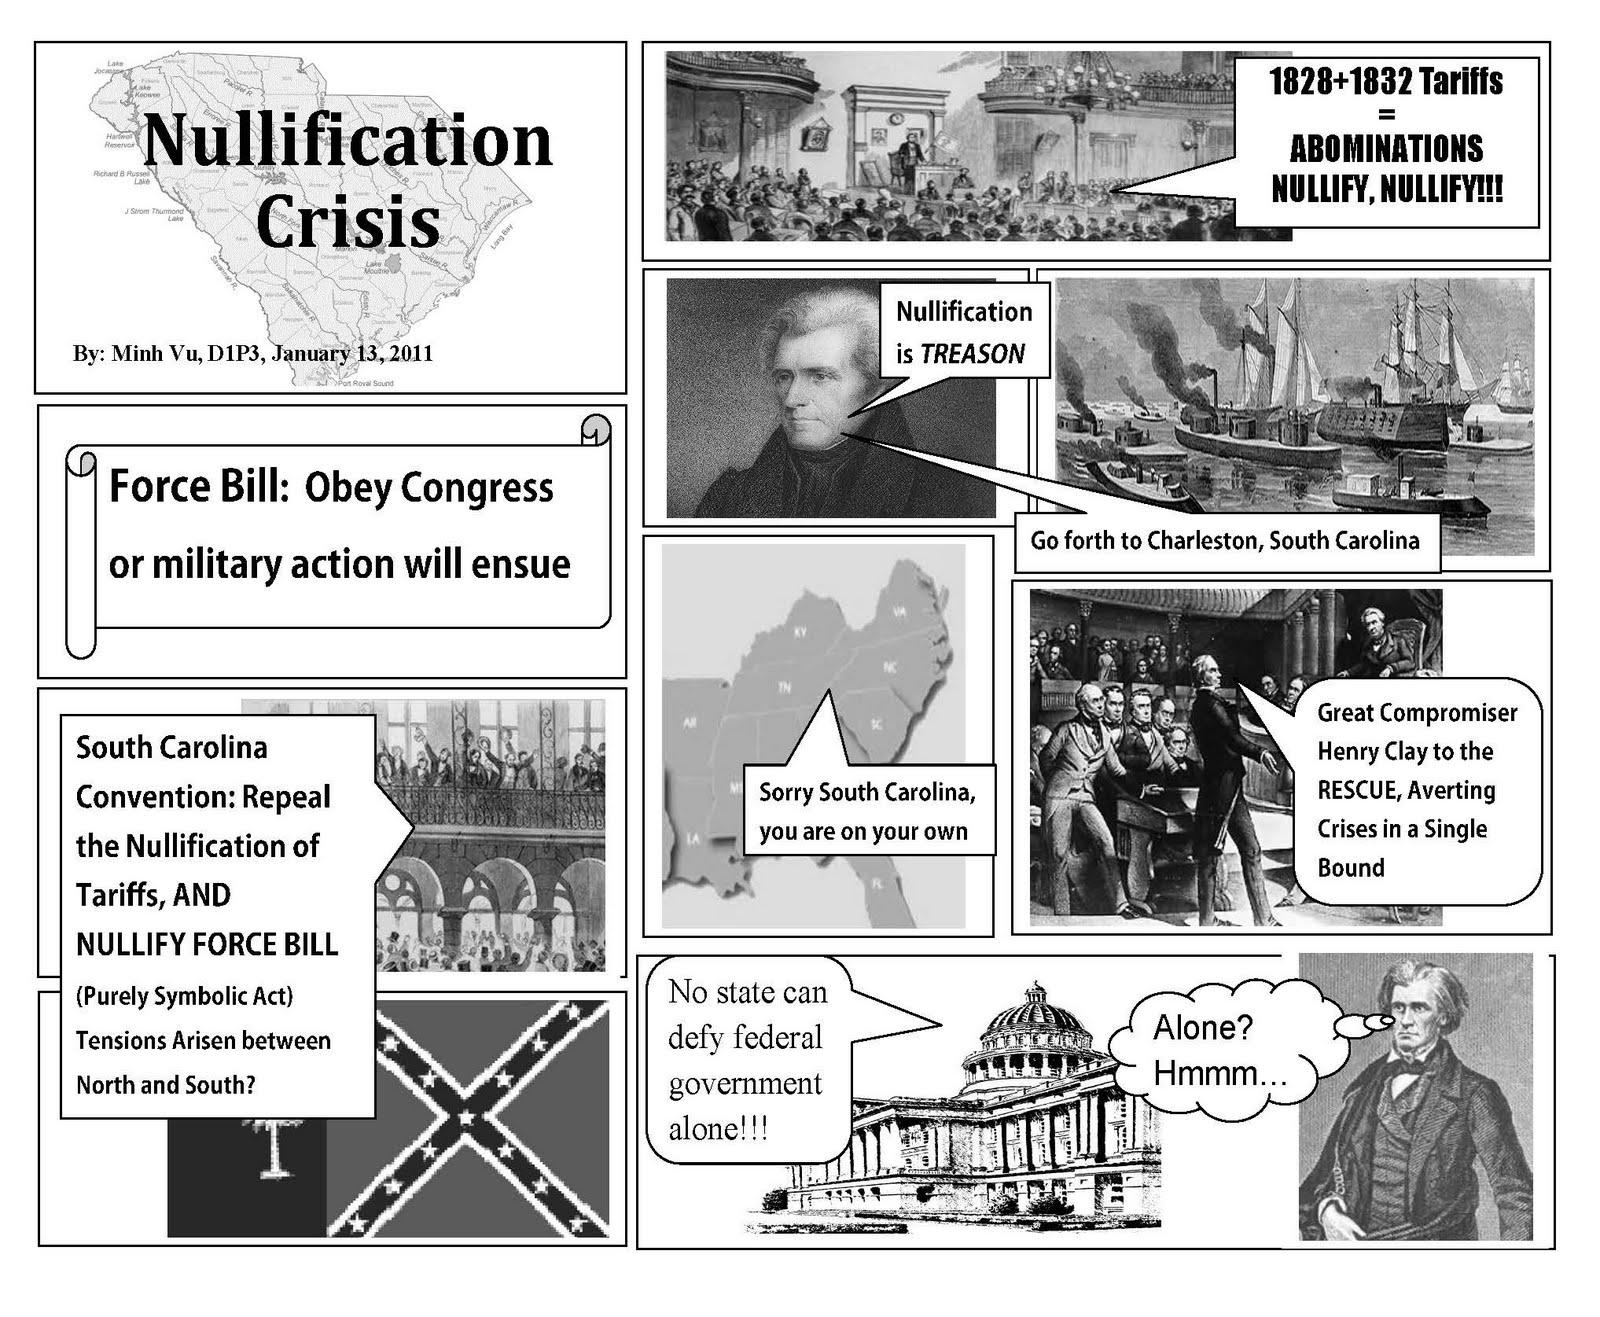 resourcesforhistoryteachers andrew jackson and jacksonian democracy